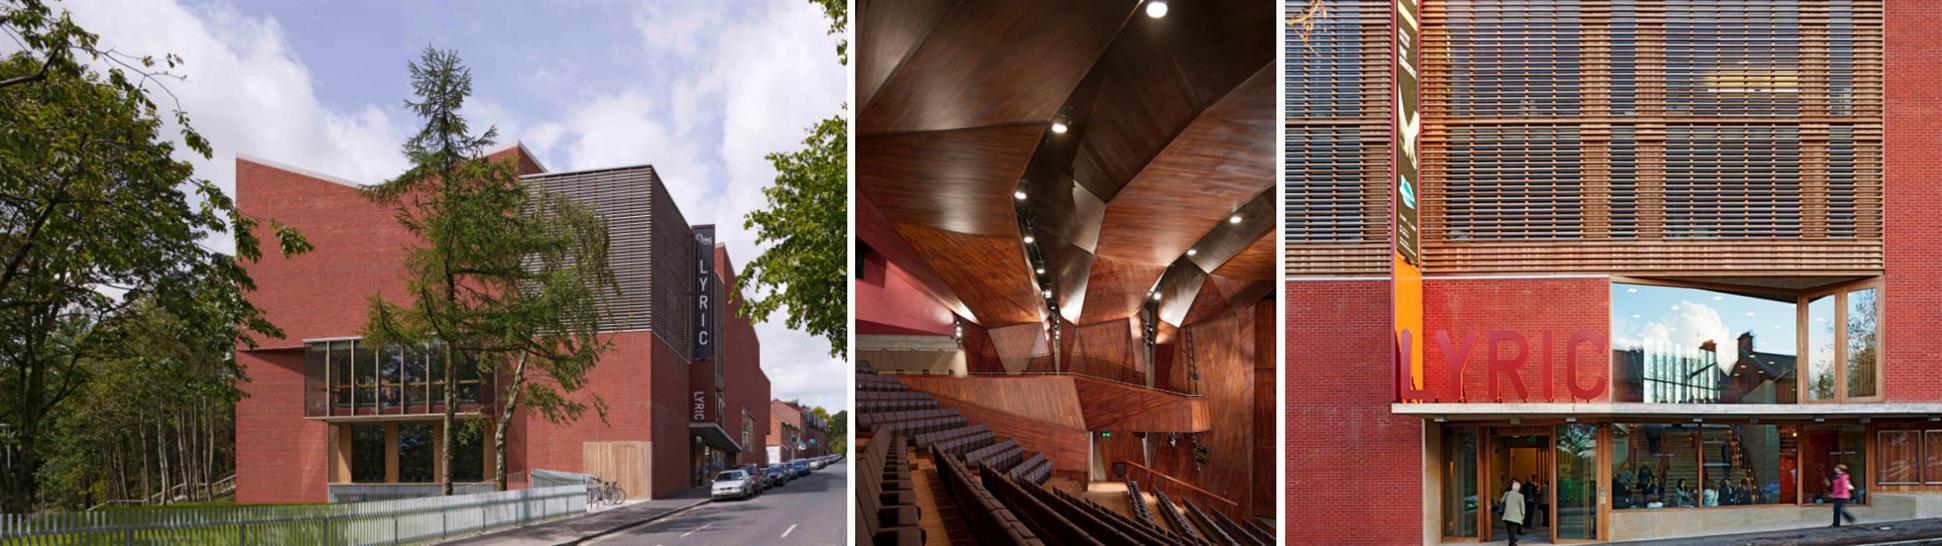 The Lyric Theatre, Belfast. Images: Dennis Gilbert